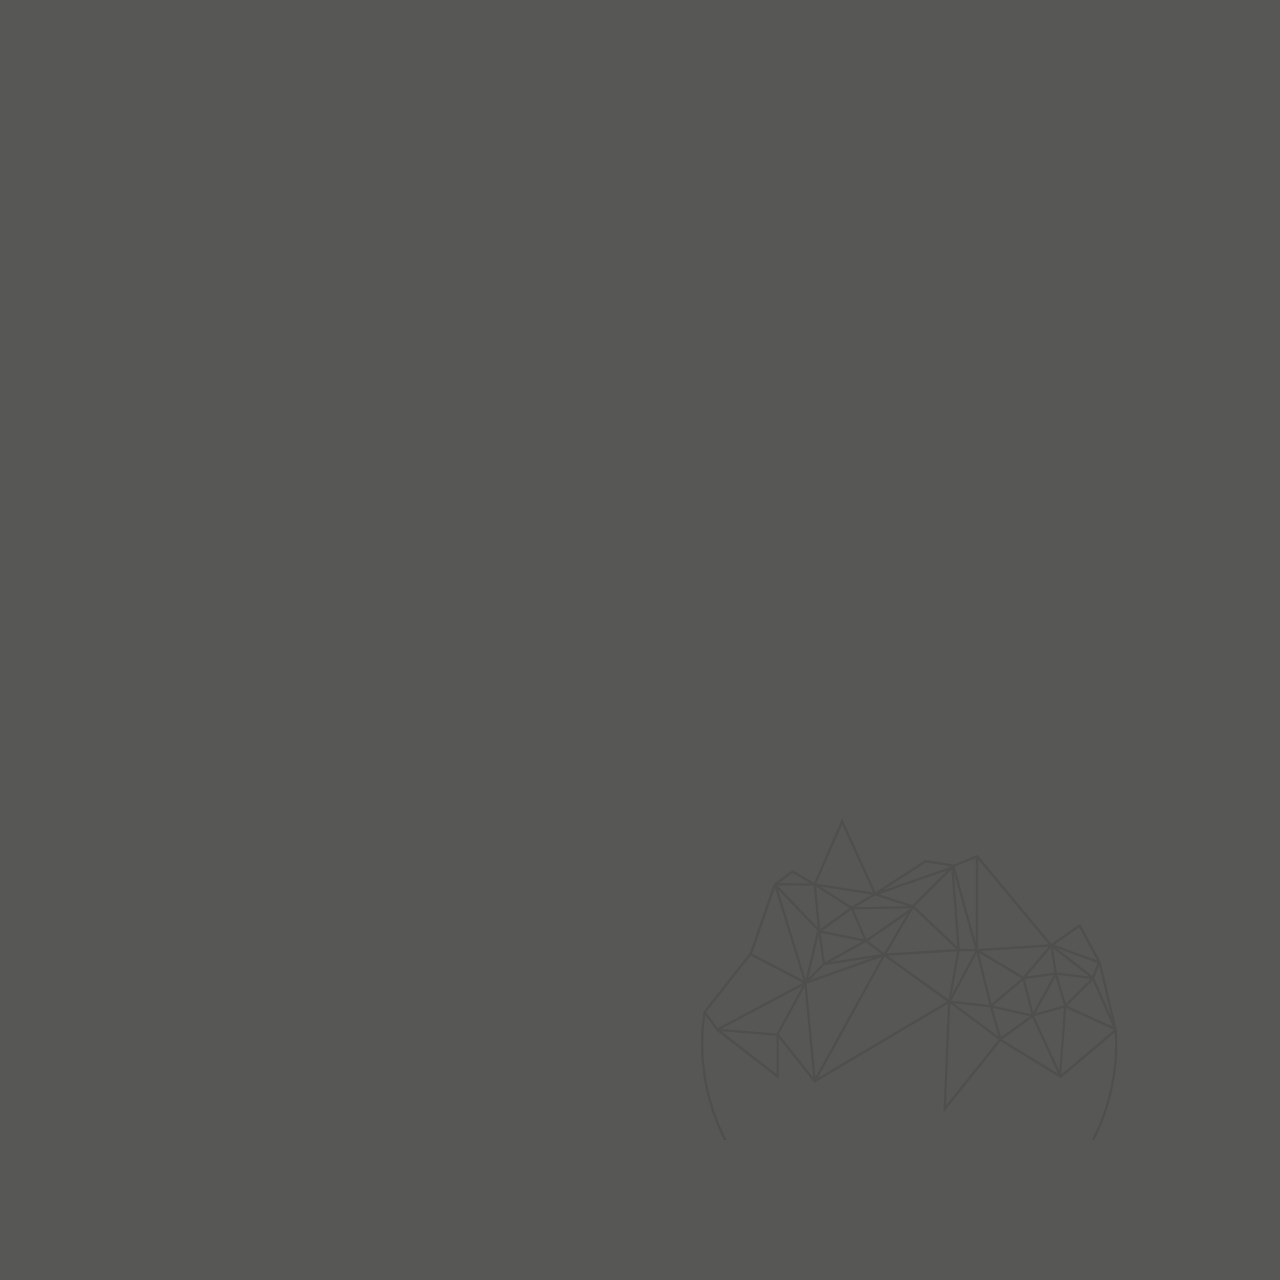 Weber Color Perfect Carbon 2 KG - Flexible wall & floor grout title=Weber Color Perfect Carbon 2 KG - Flexible wall & floor grout